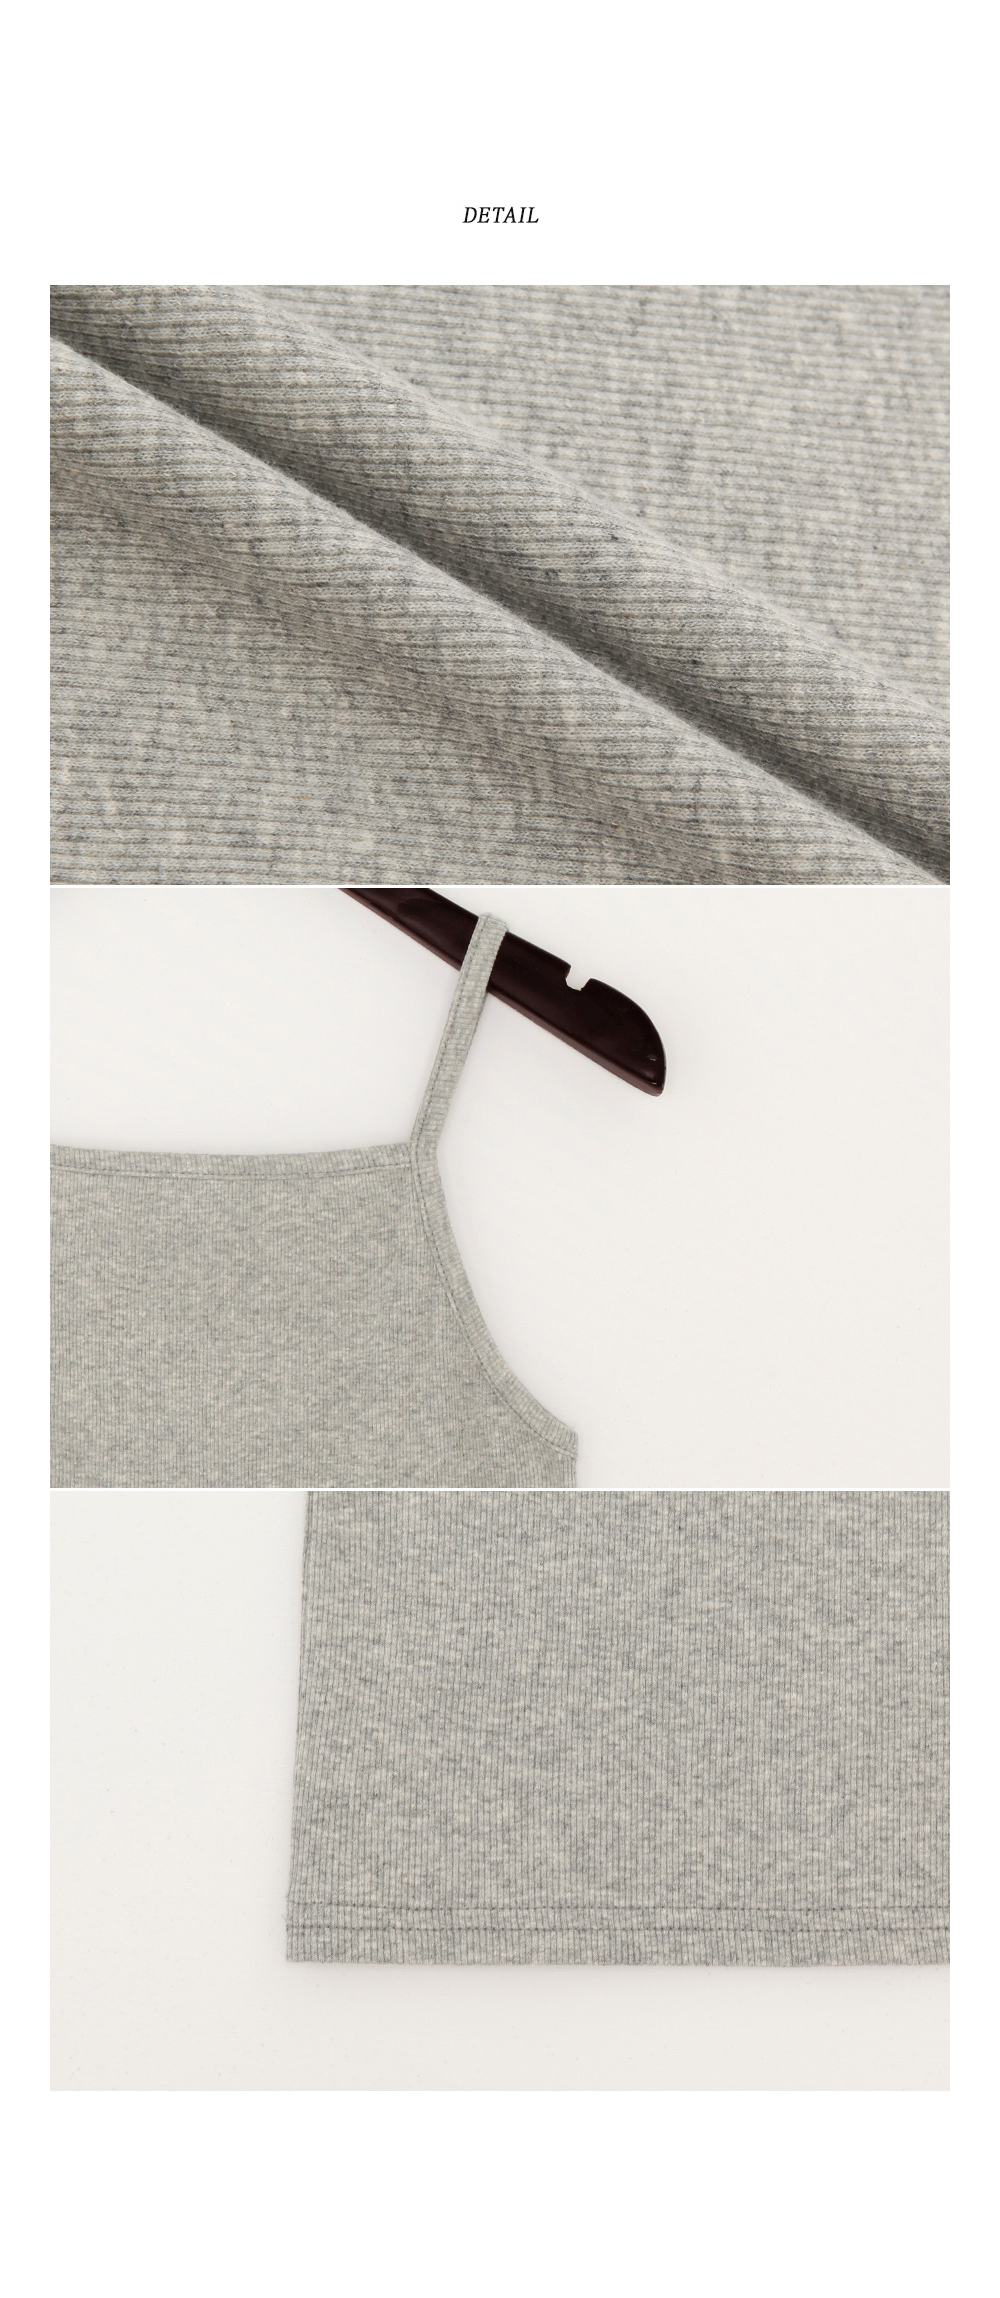 socks detail image-S1L12